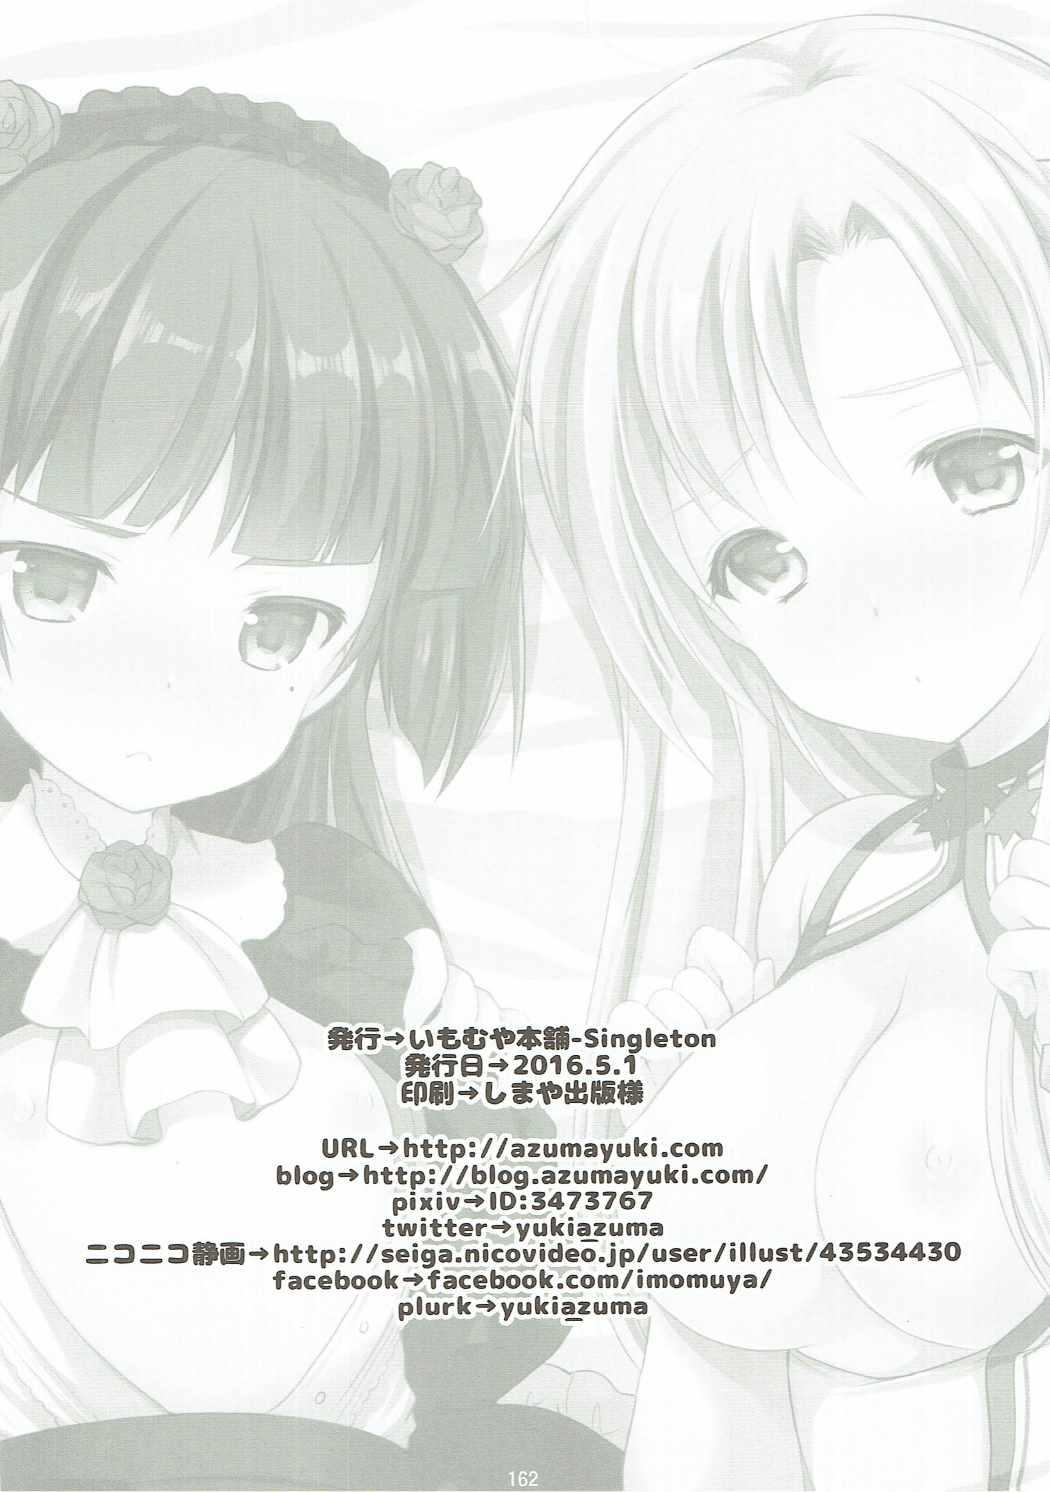 ANIME COLLECTION Imomuya Honpo - Singleton Anime Soushuuhen 160